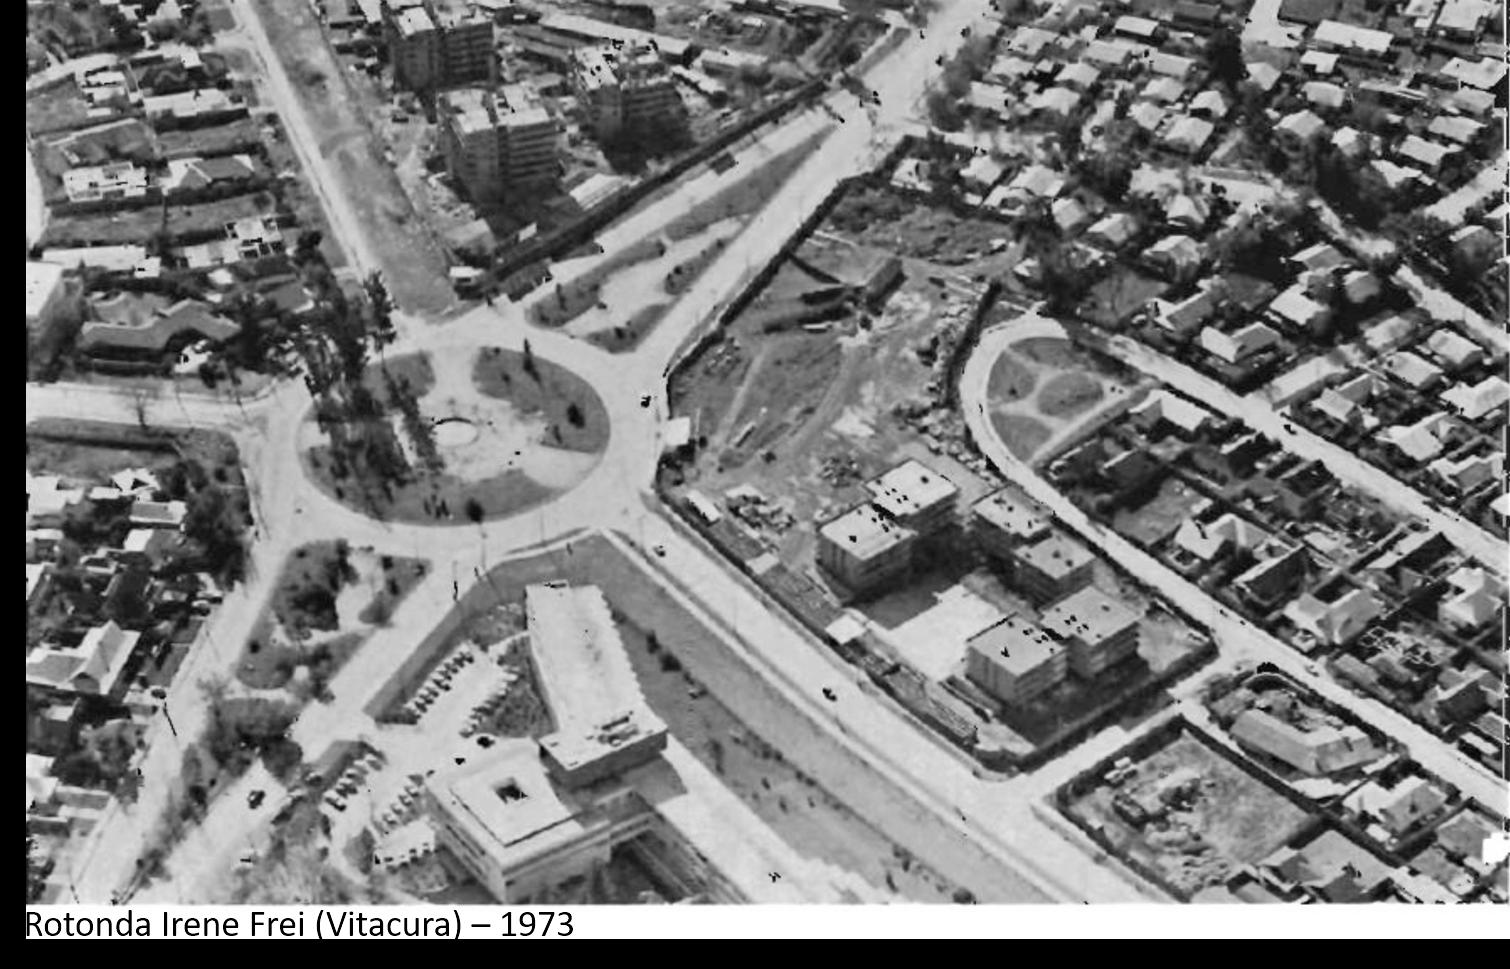 Enterreno - Fotos históricas de chile - fotos antiguas de Chile - Rotonda Irene Frei de Cid (Vitacura), 1973